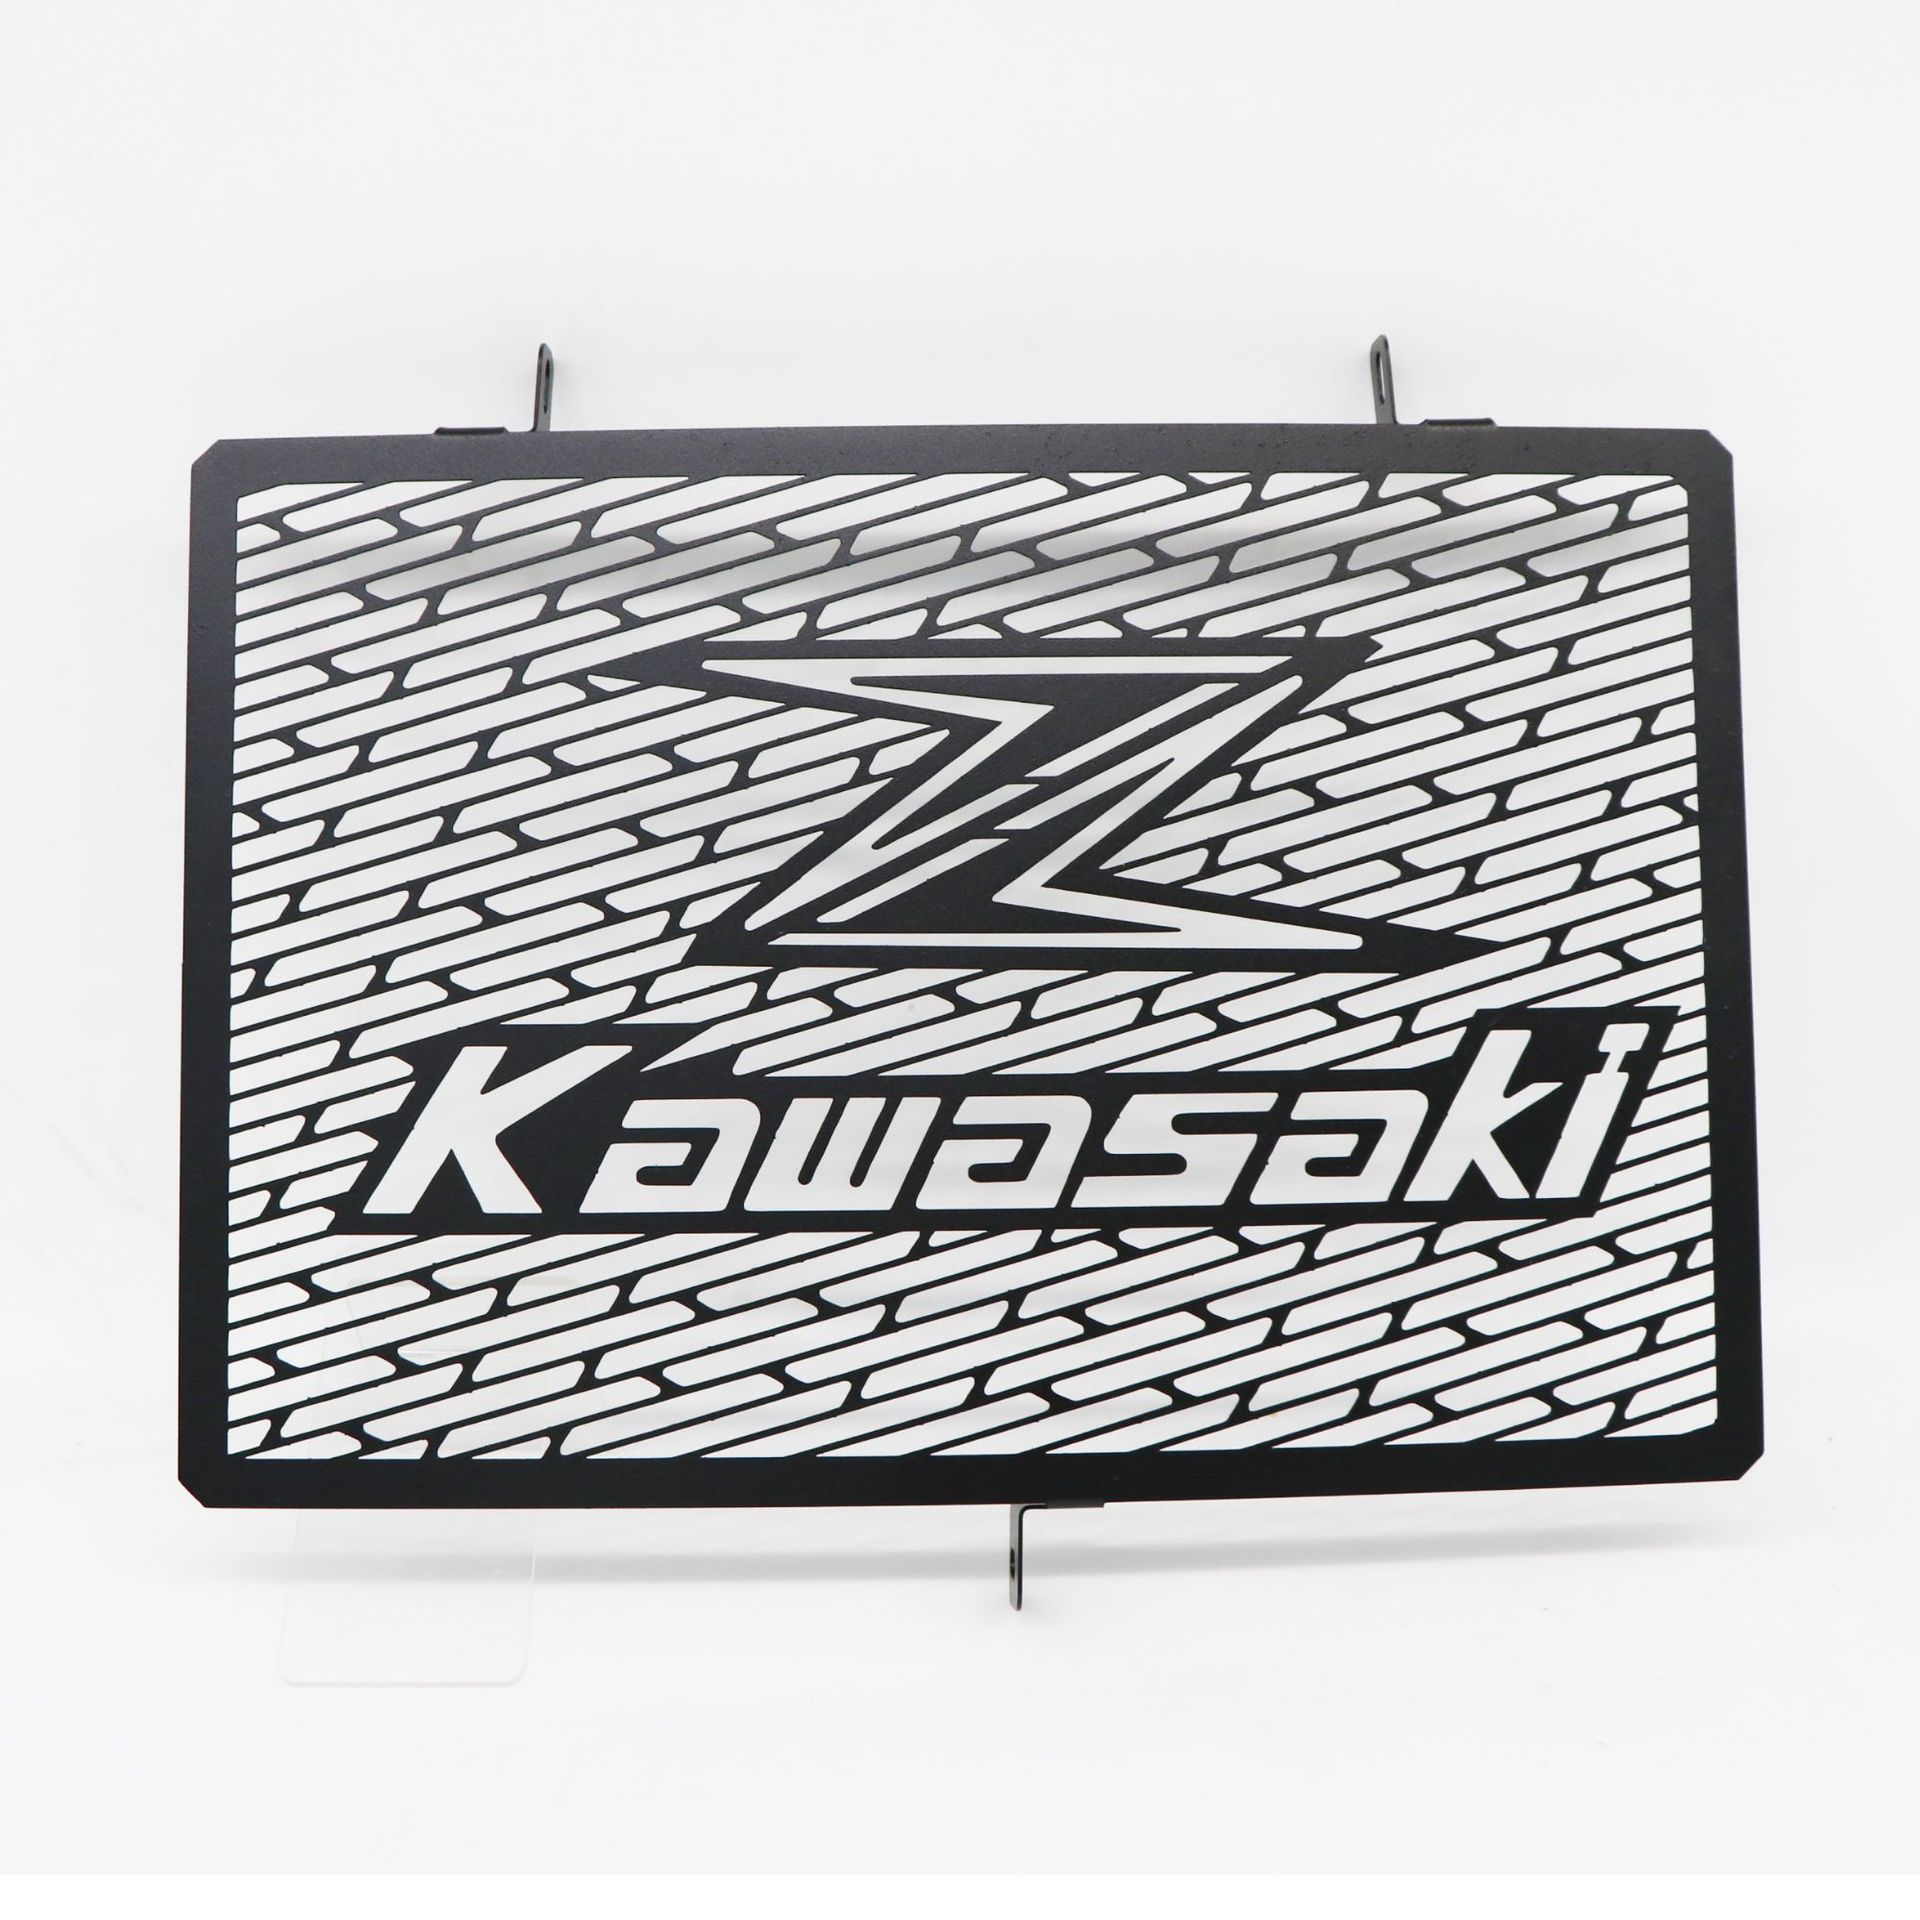 For Kawasaki Z800 Z1000 Motorcycle Radiator Grille Guard Gill Cover Protector black